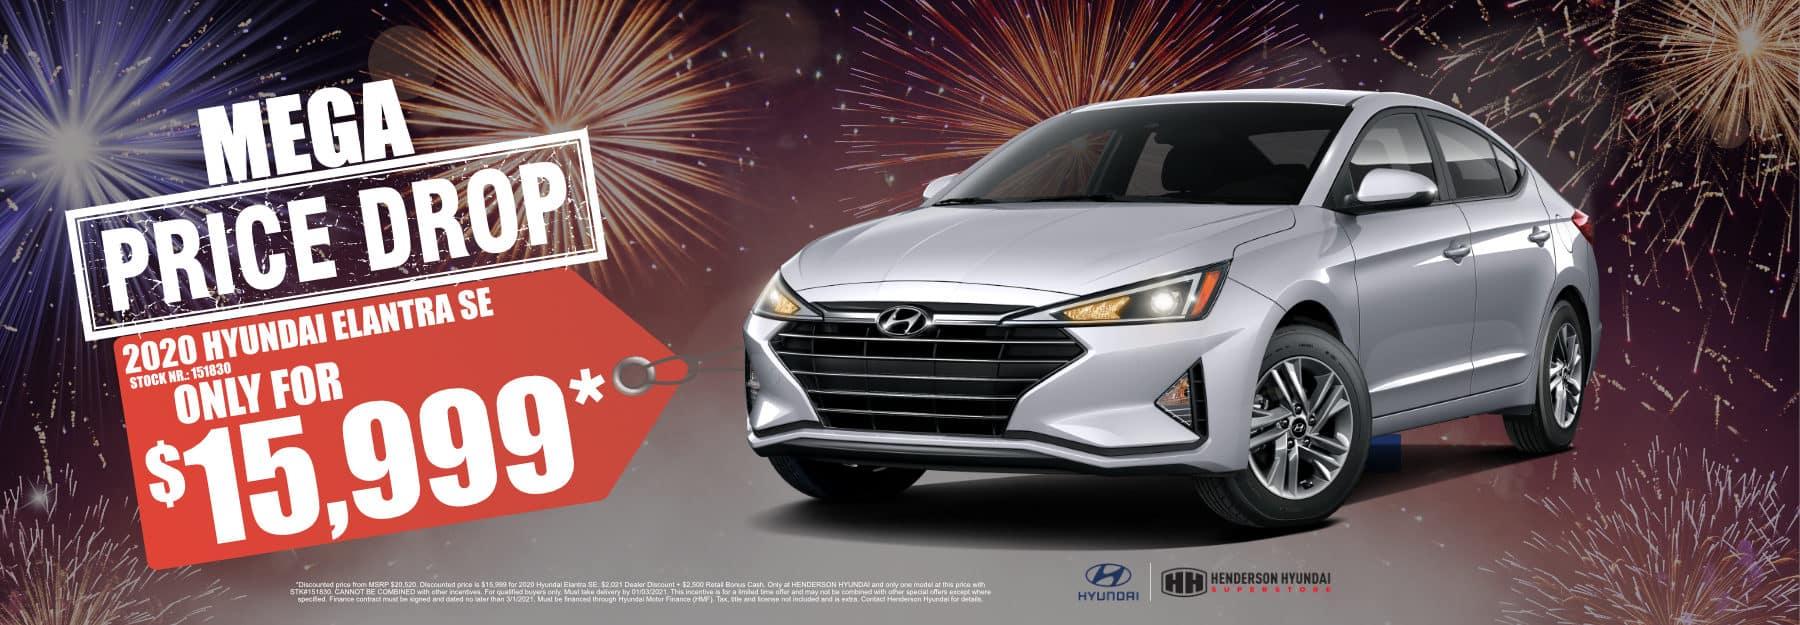 January_2021 Elantra Mega Pice Drop Henderson Hyundai